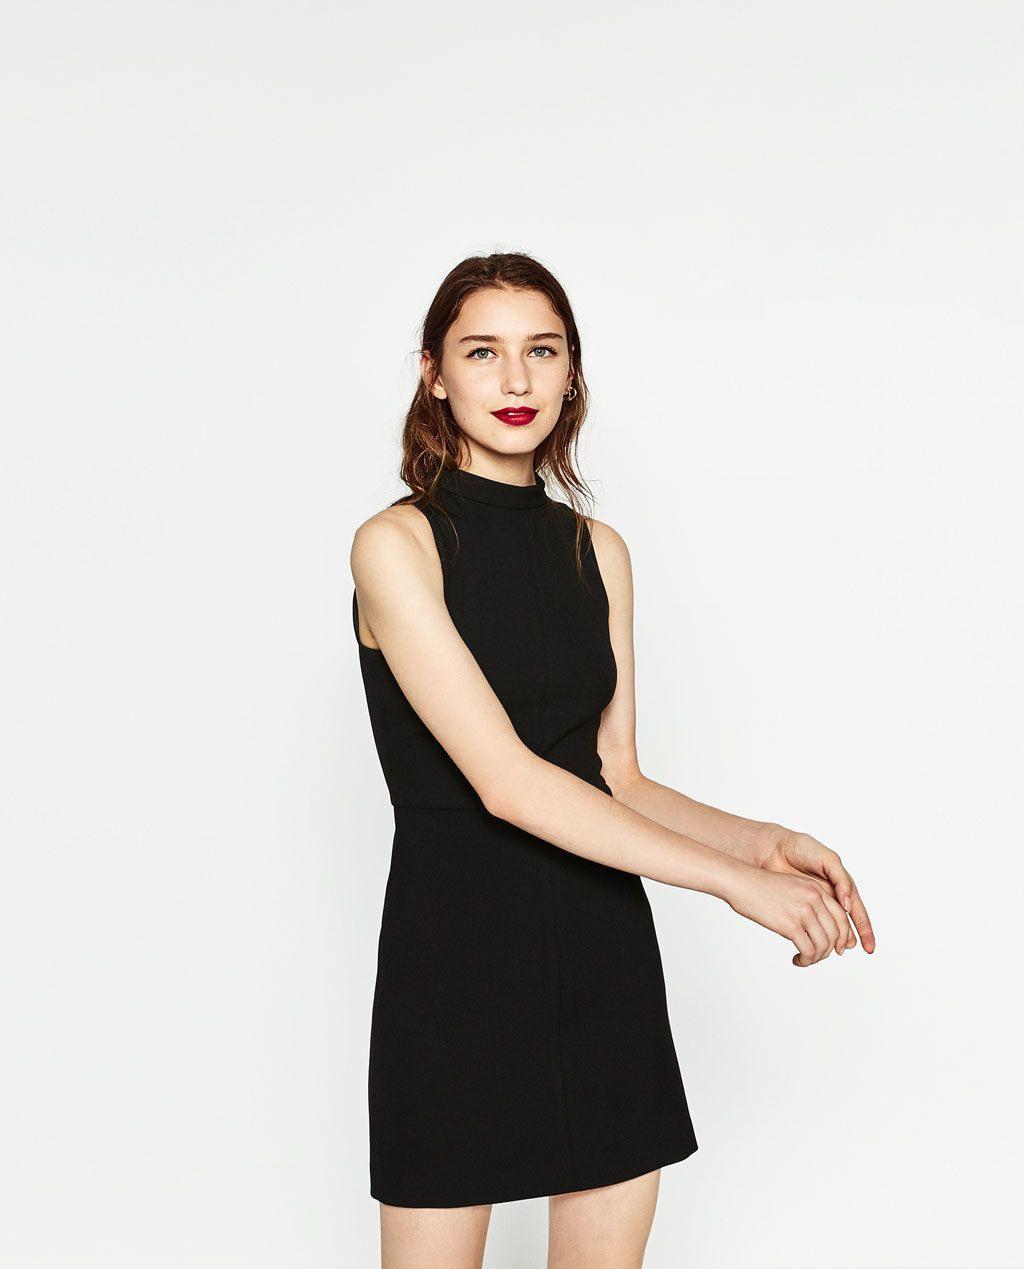 Zara  Woman  Tube Dress  Schlauchkleid Kleider Frau